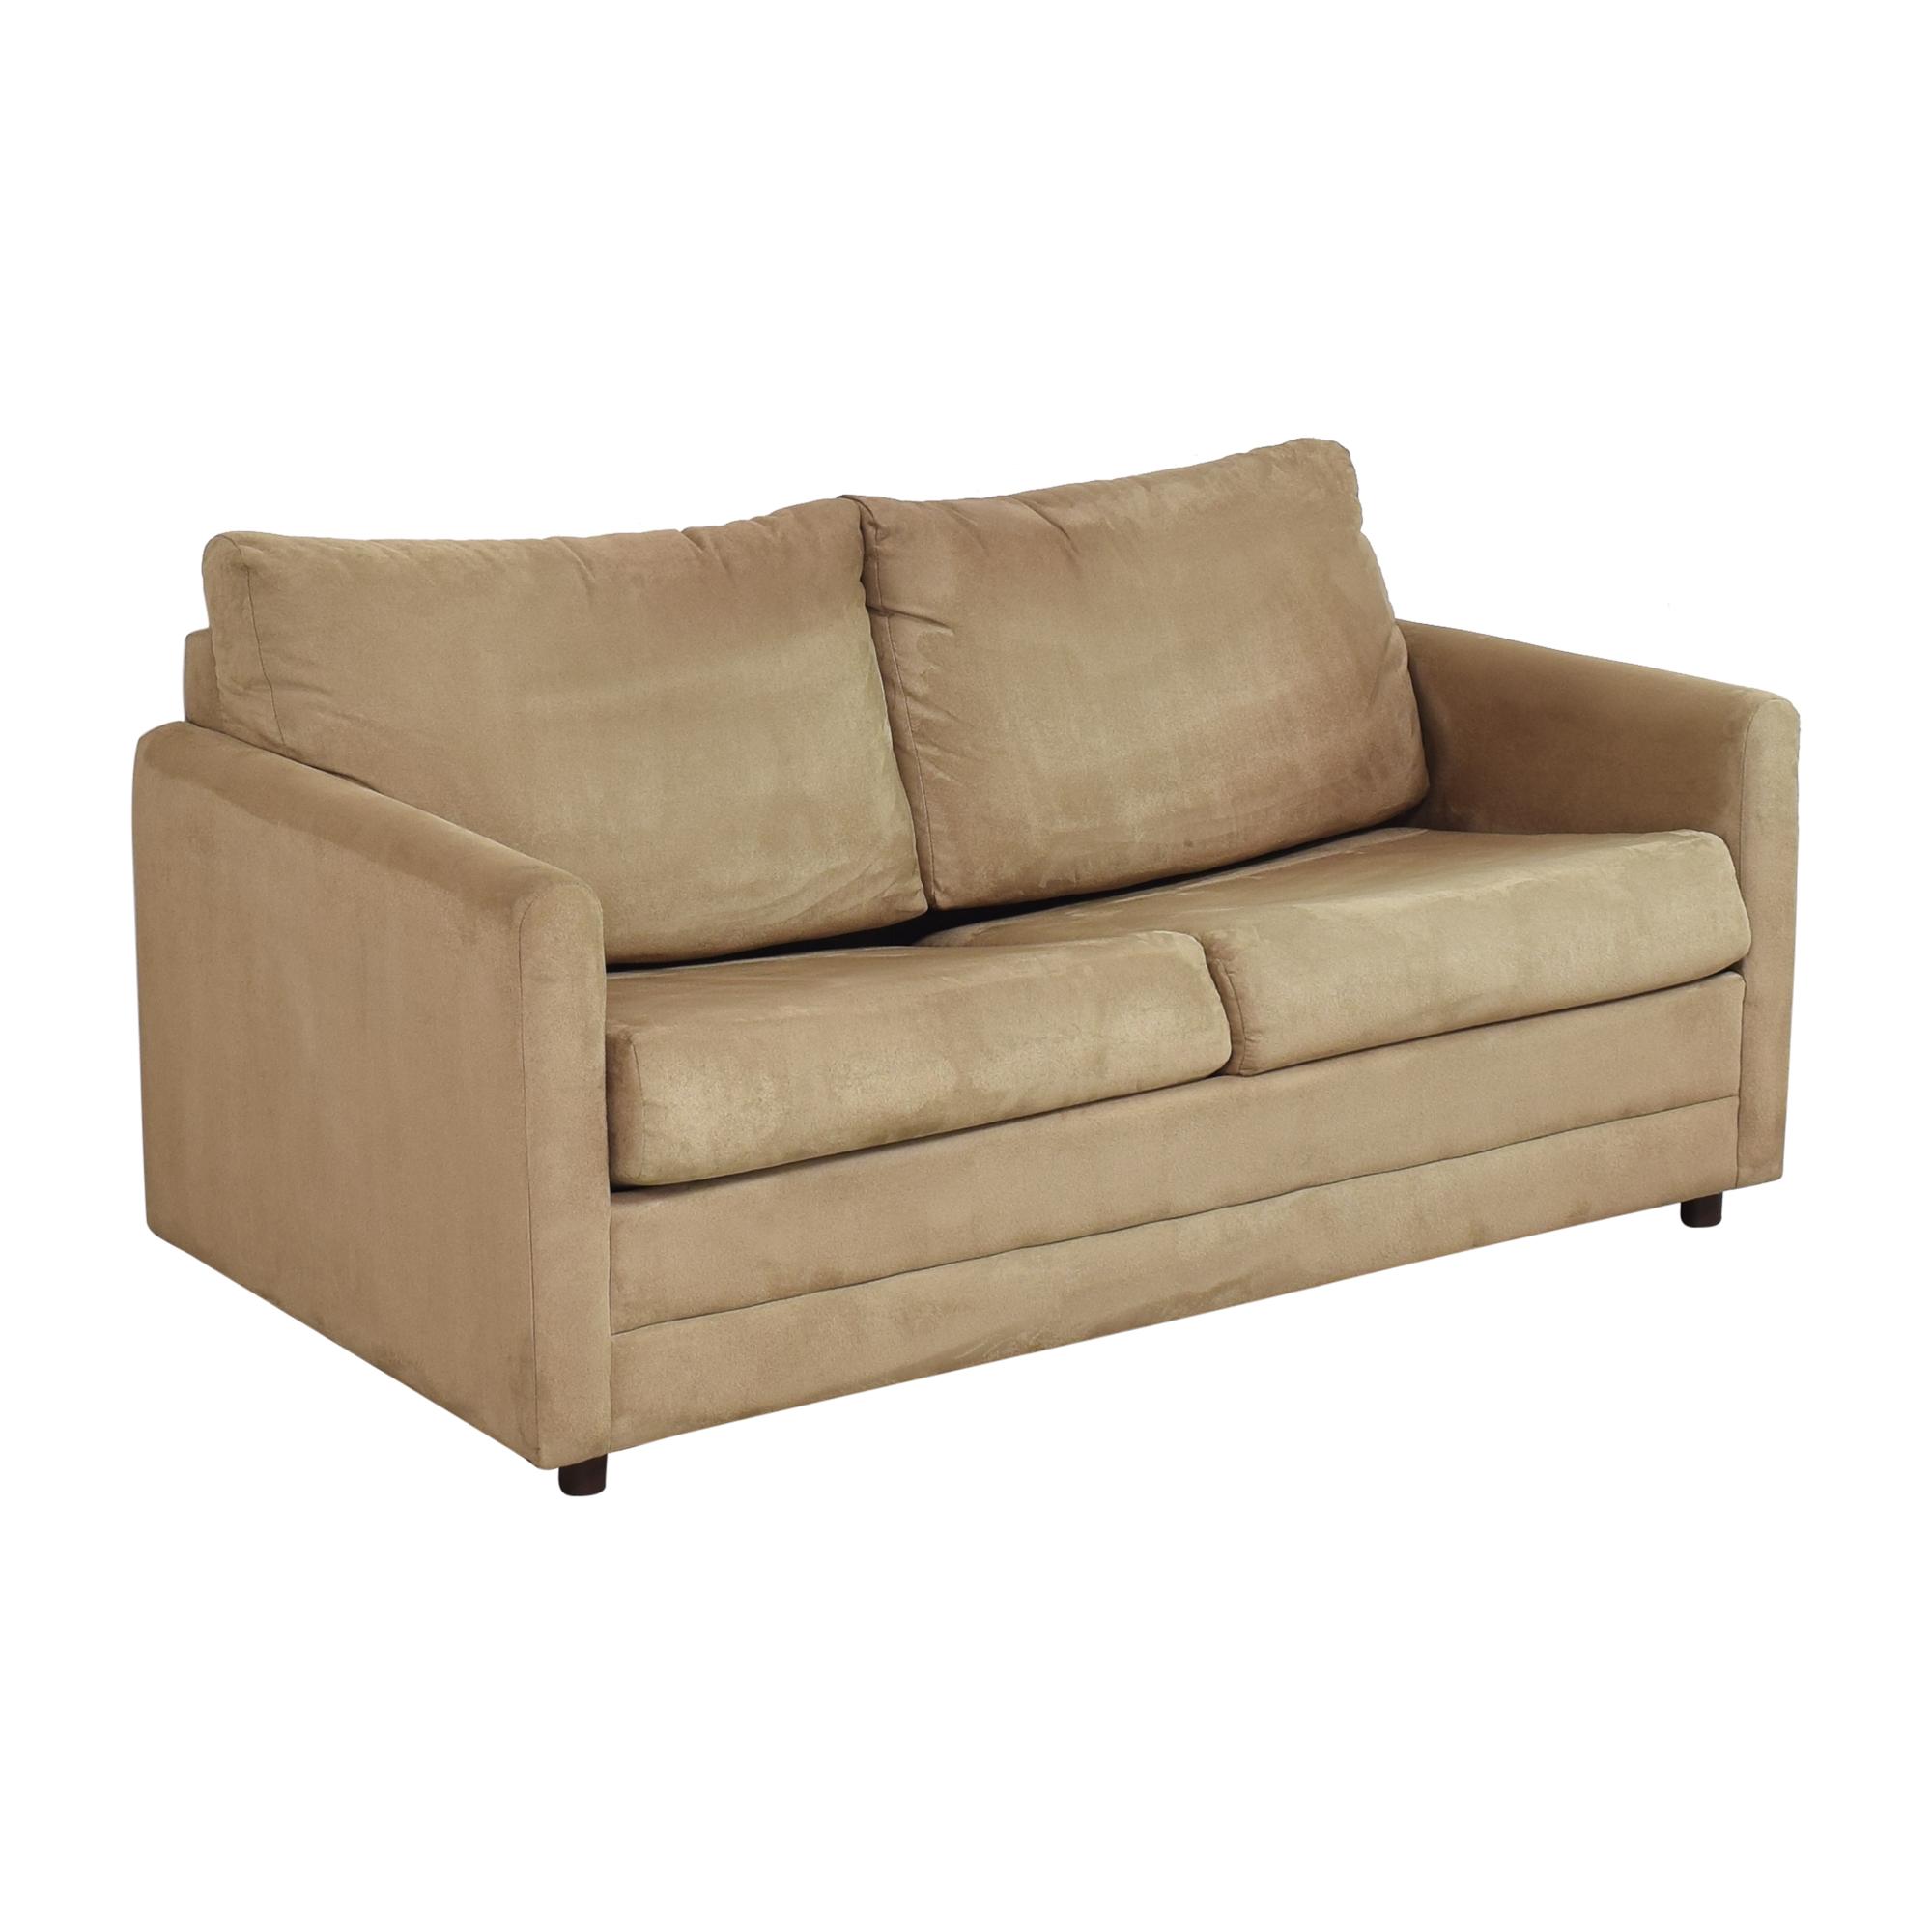 LaCrosse Furniture Lacrosse Furniture Two Cushion Sleeper Loveseat Sofas